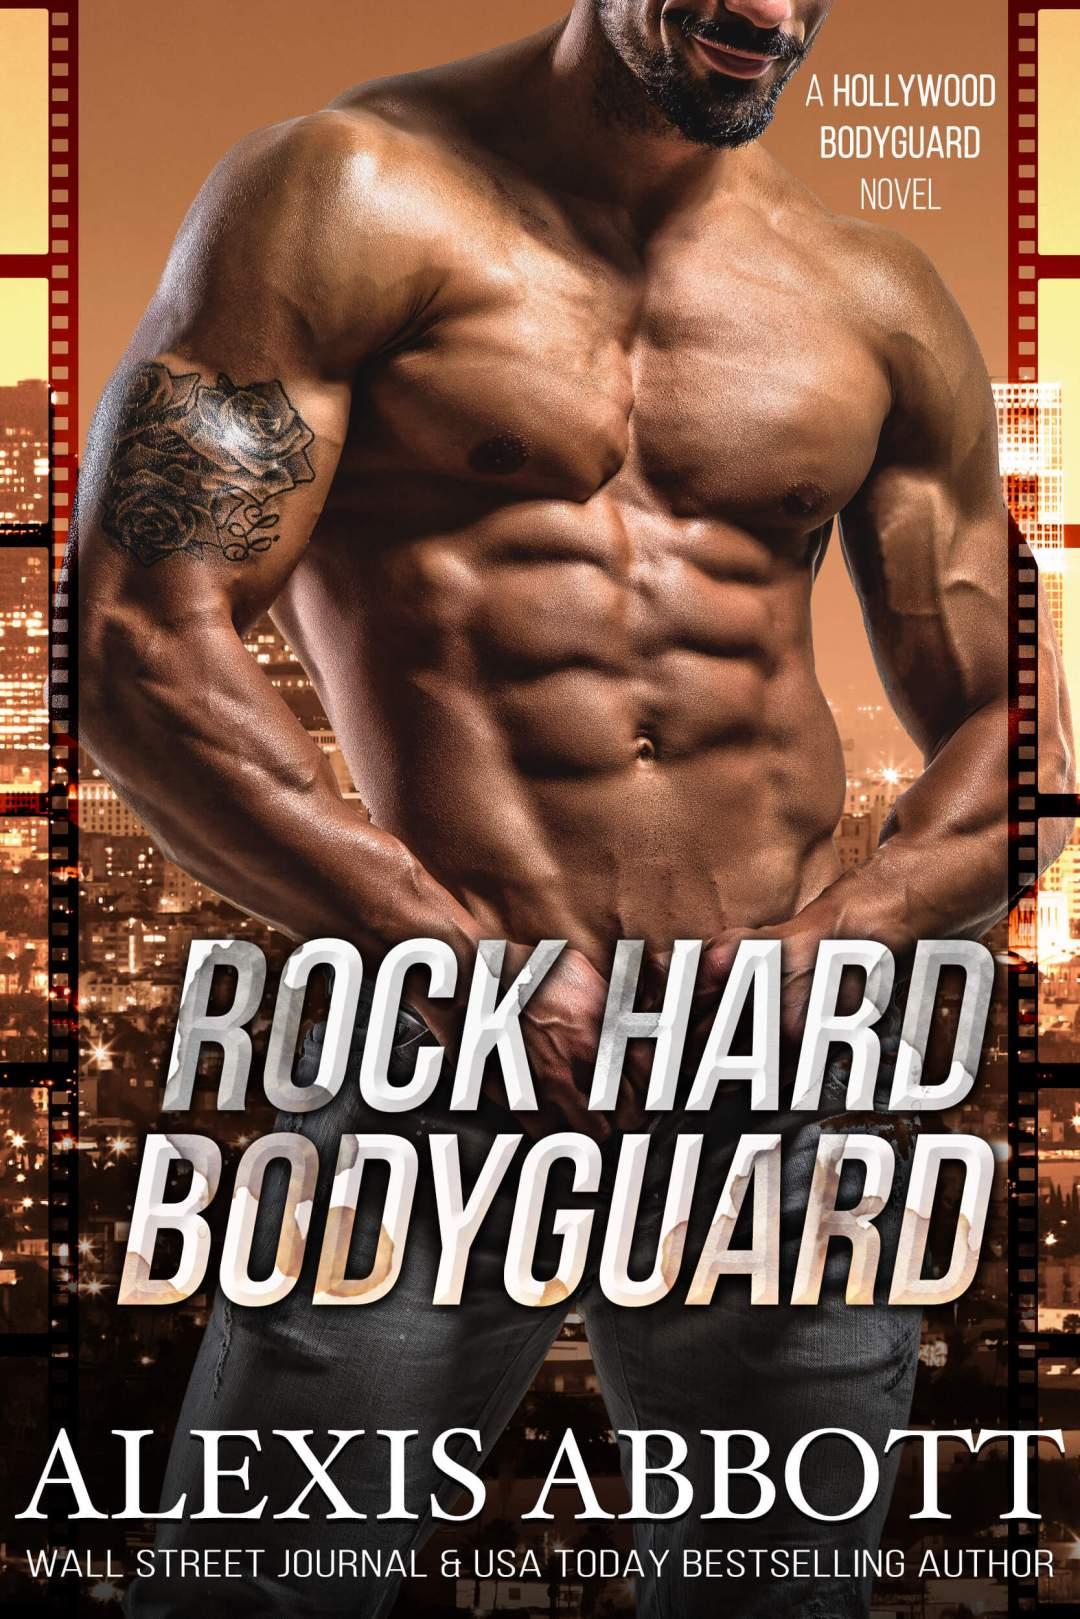 Alexis Abbott - Rock Hard Bodyguard